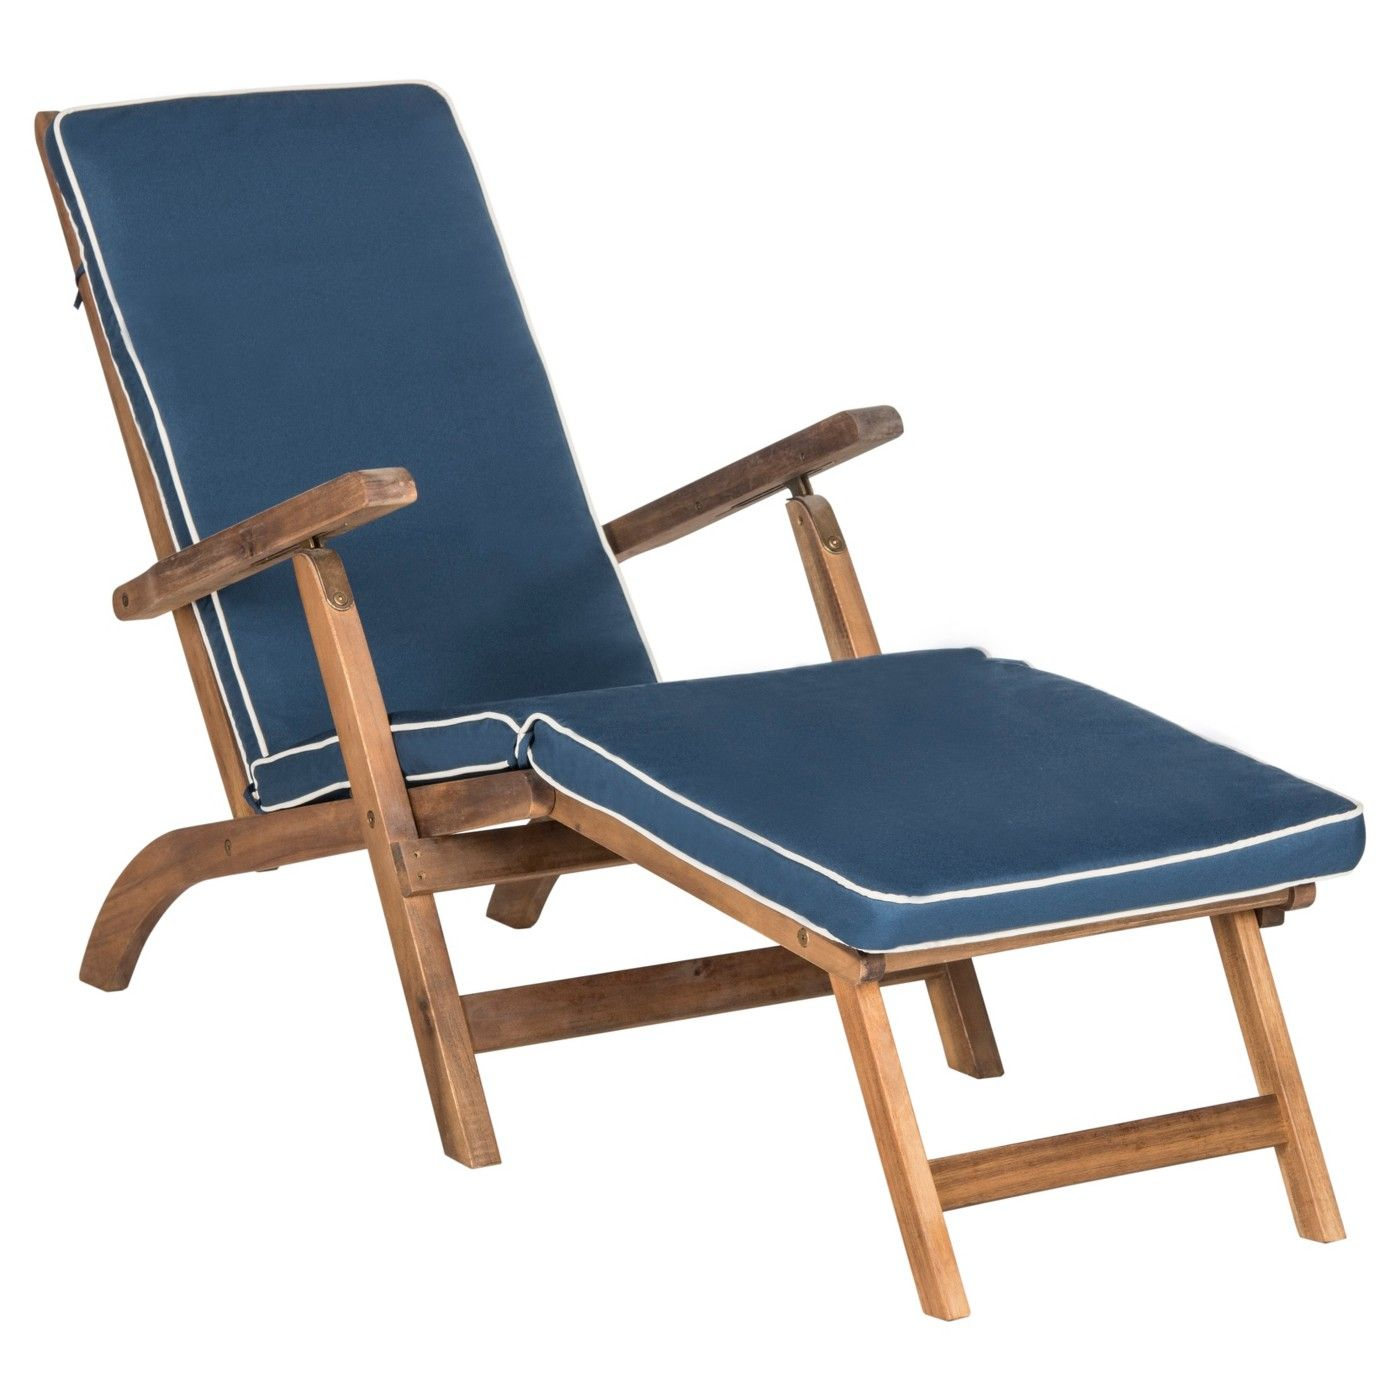 Palmdale Folding Lounge Chair Teak Brown / Navy